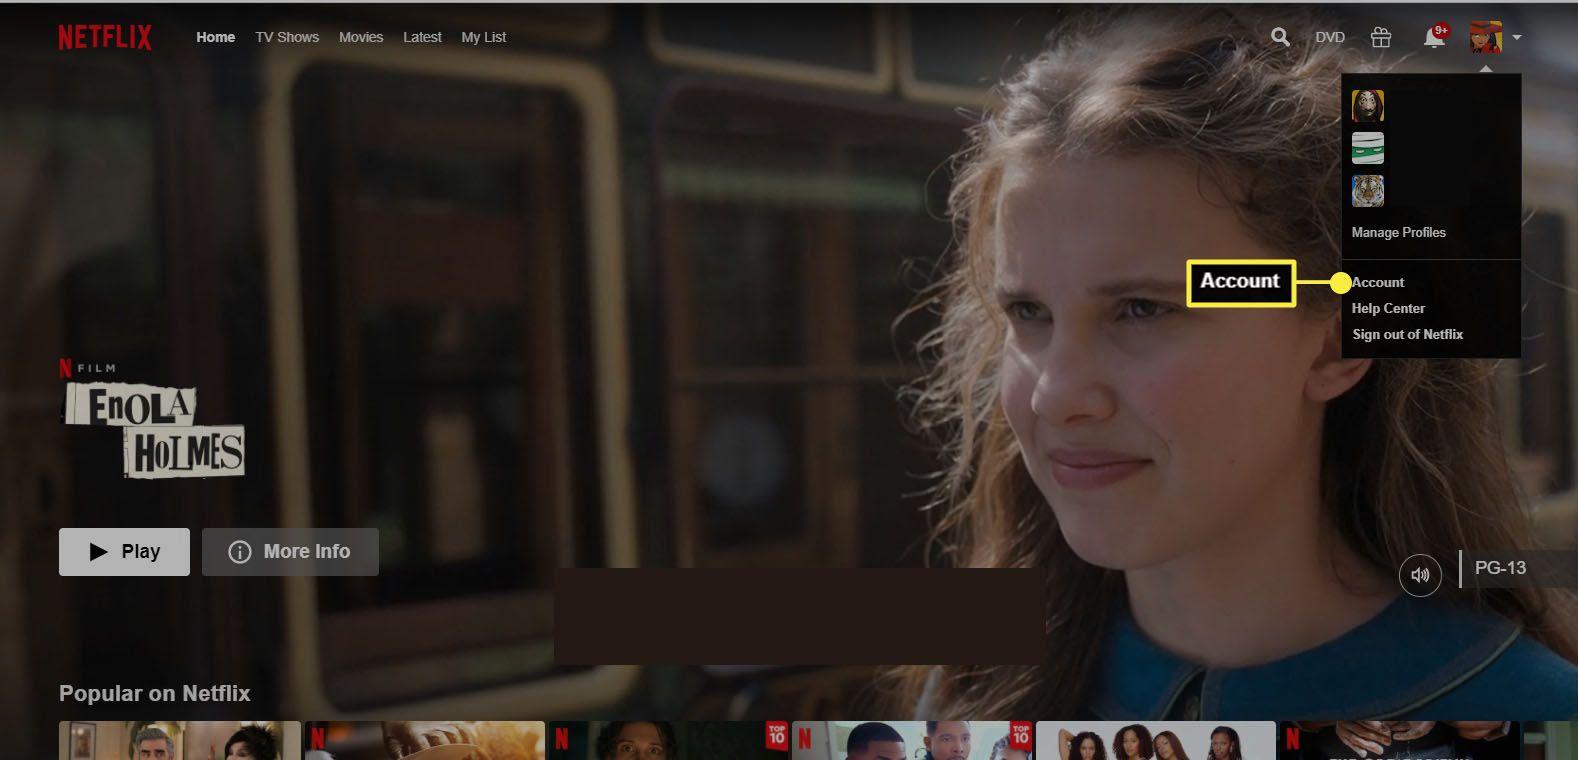 Netflix - select Account